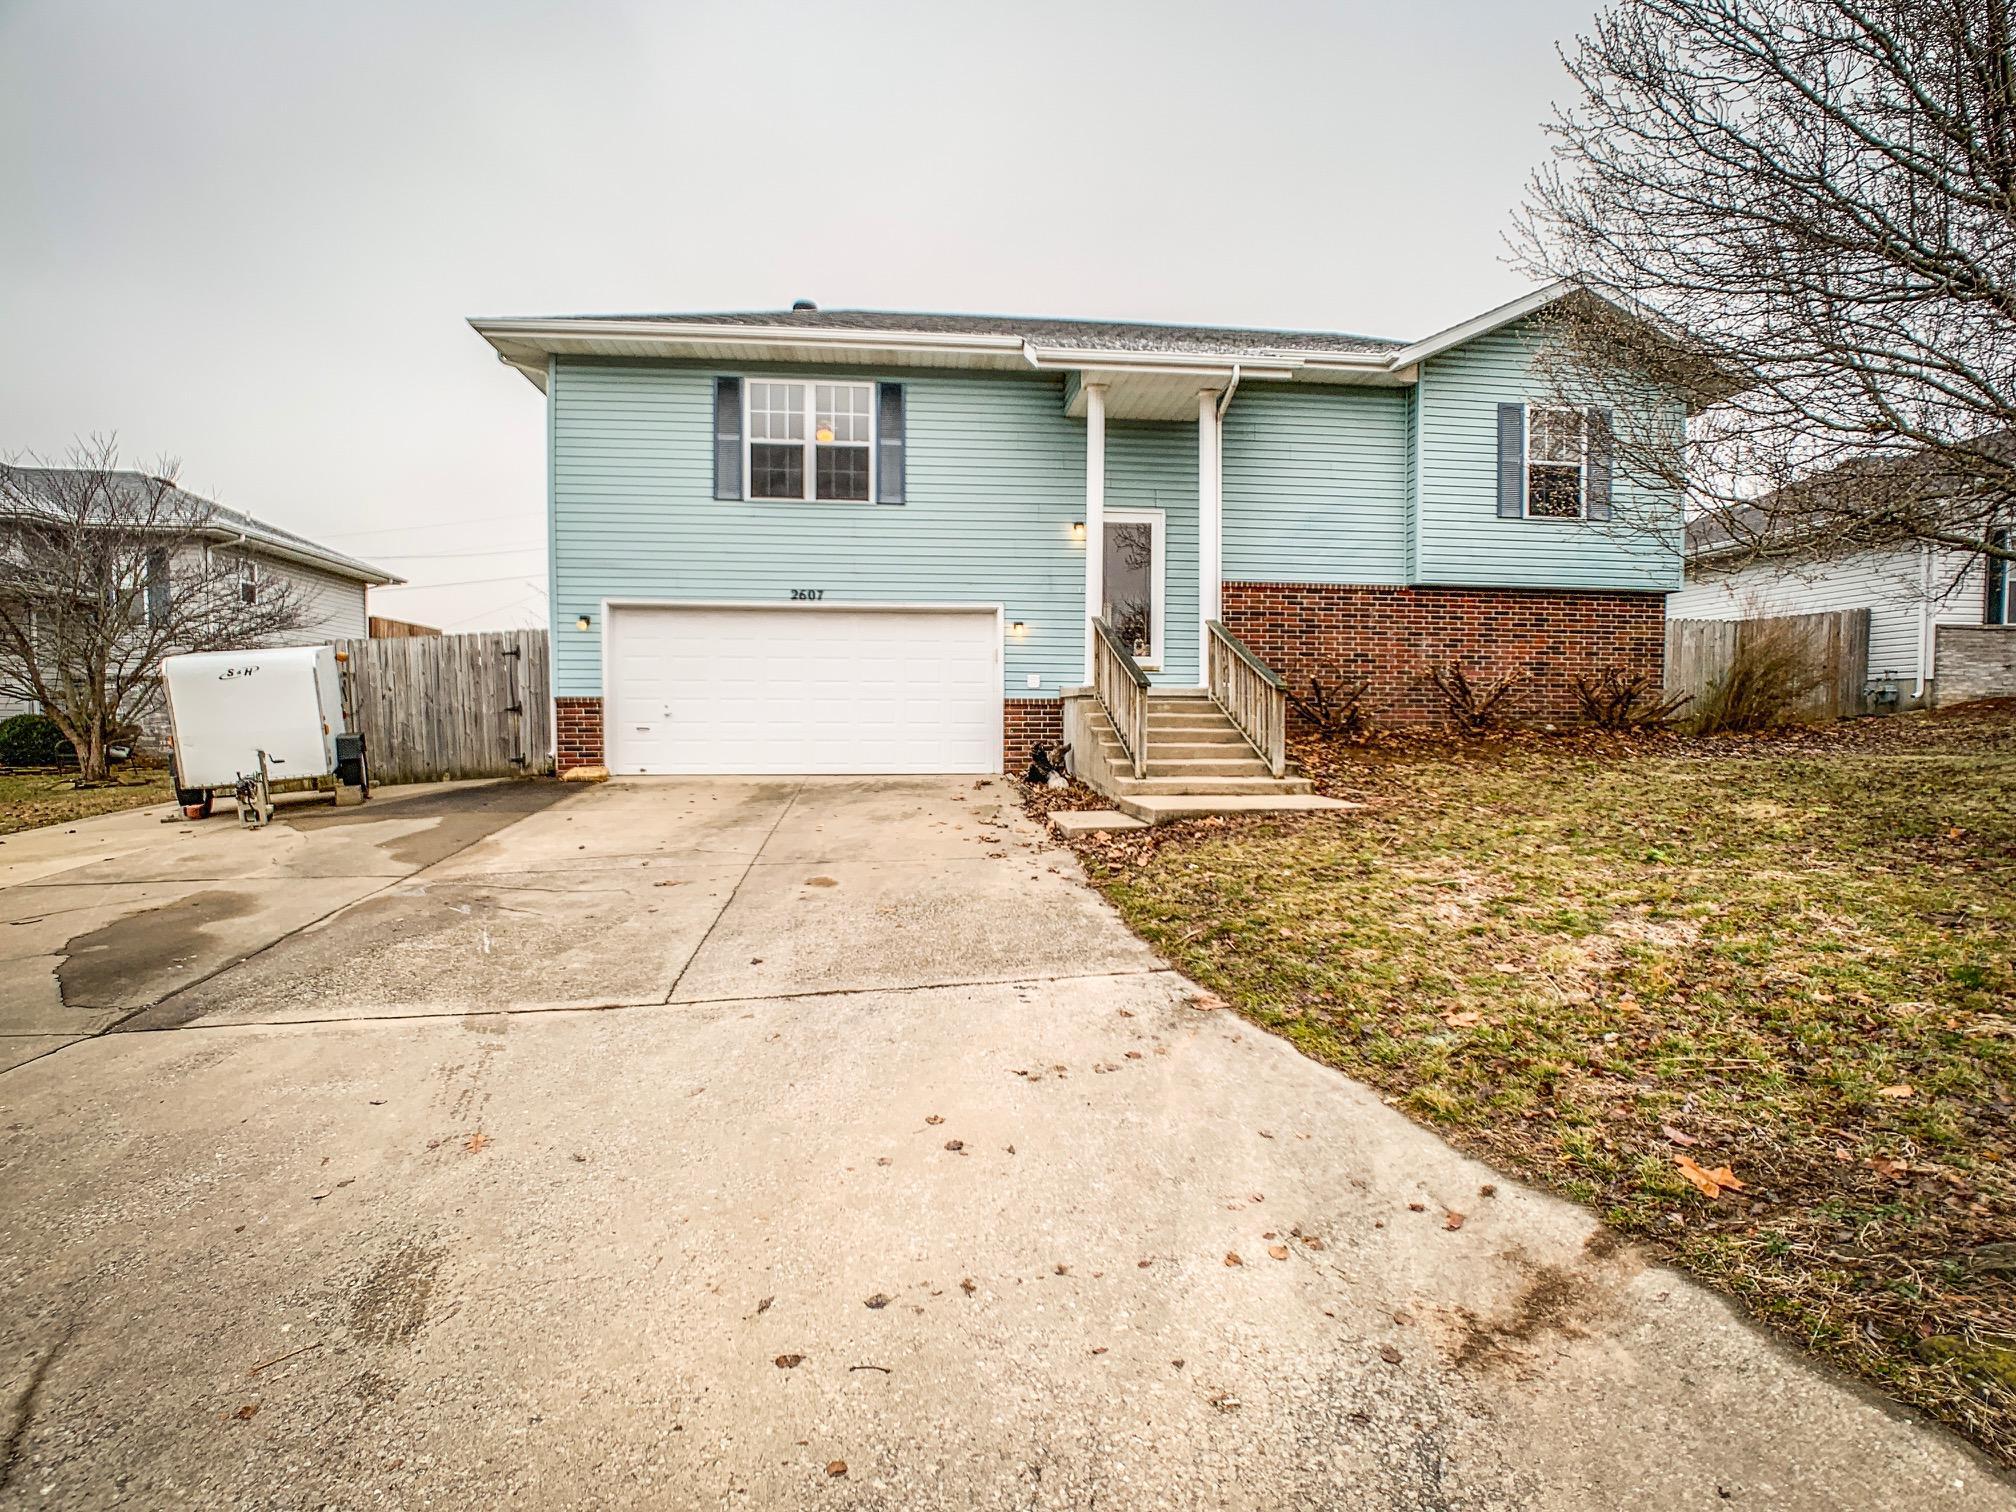 2607 South Lilac Street Ozark, MO 65721